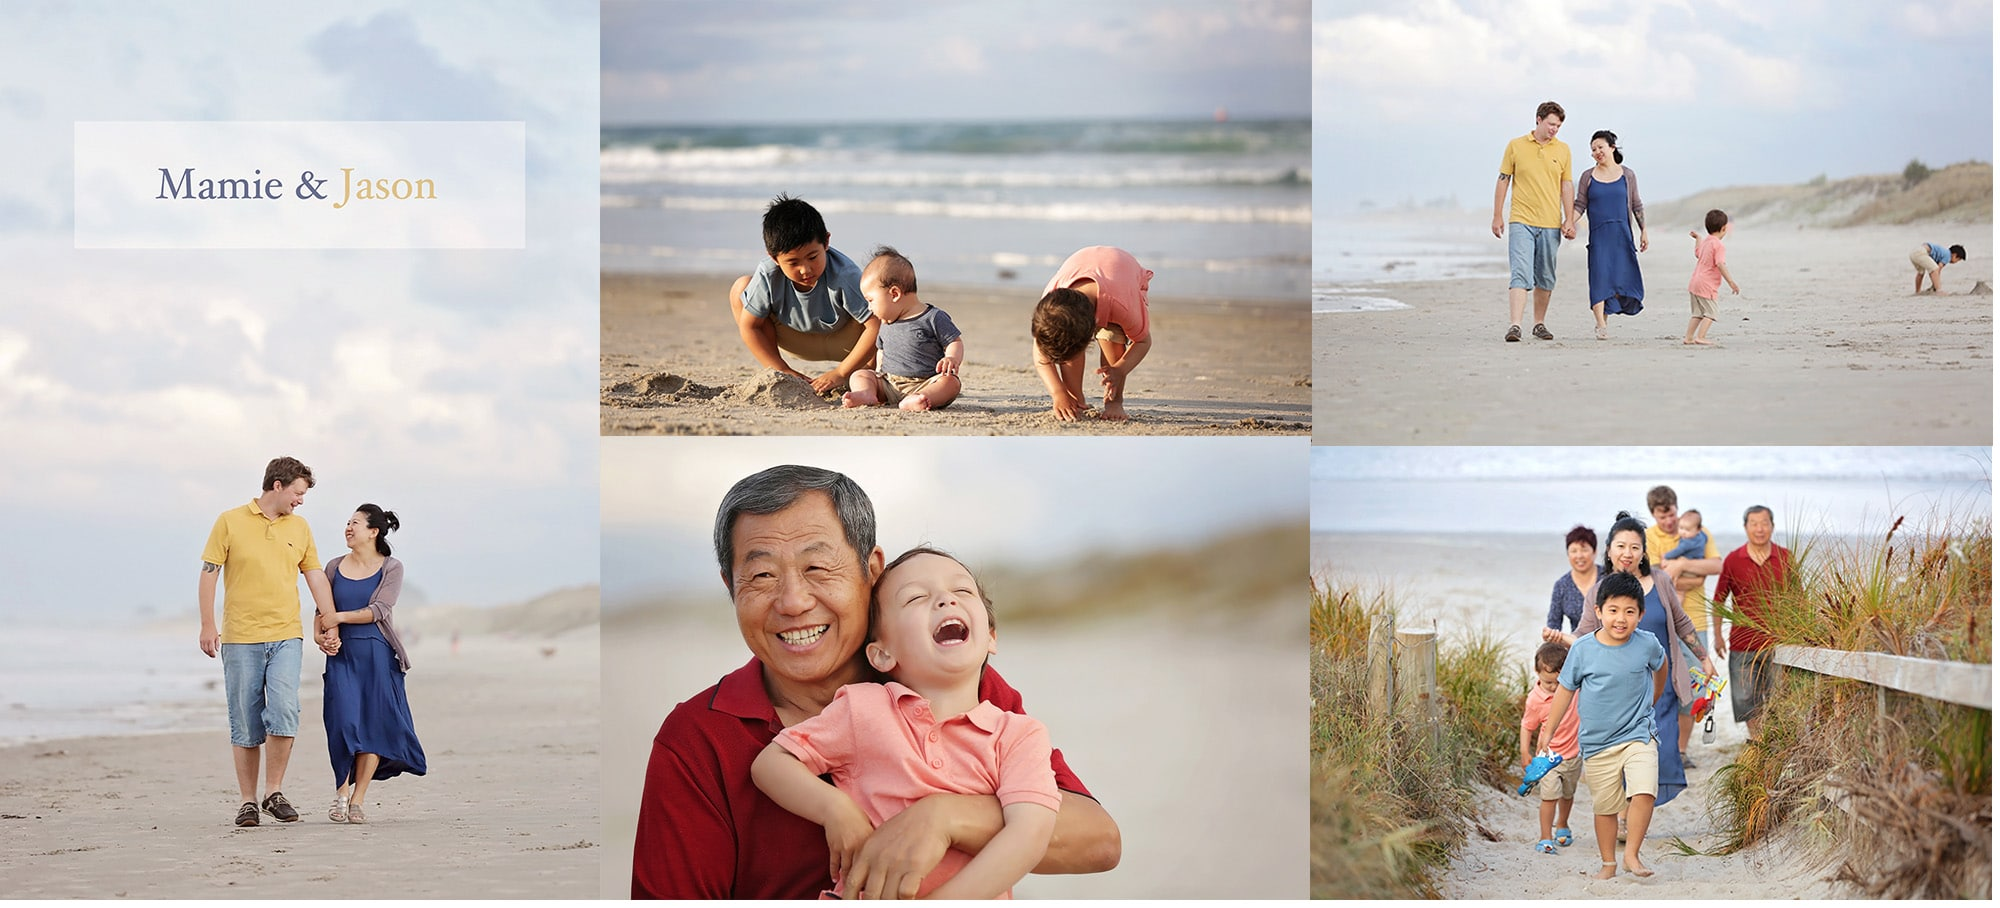 Papamoa Beach family session by Susanna Lin Photography